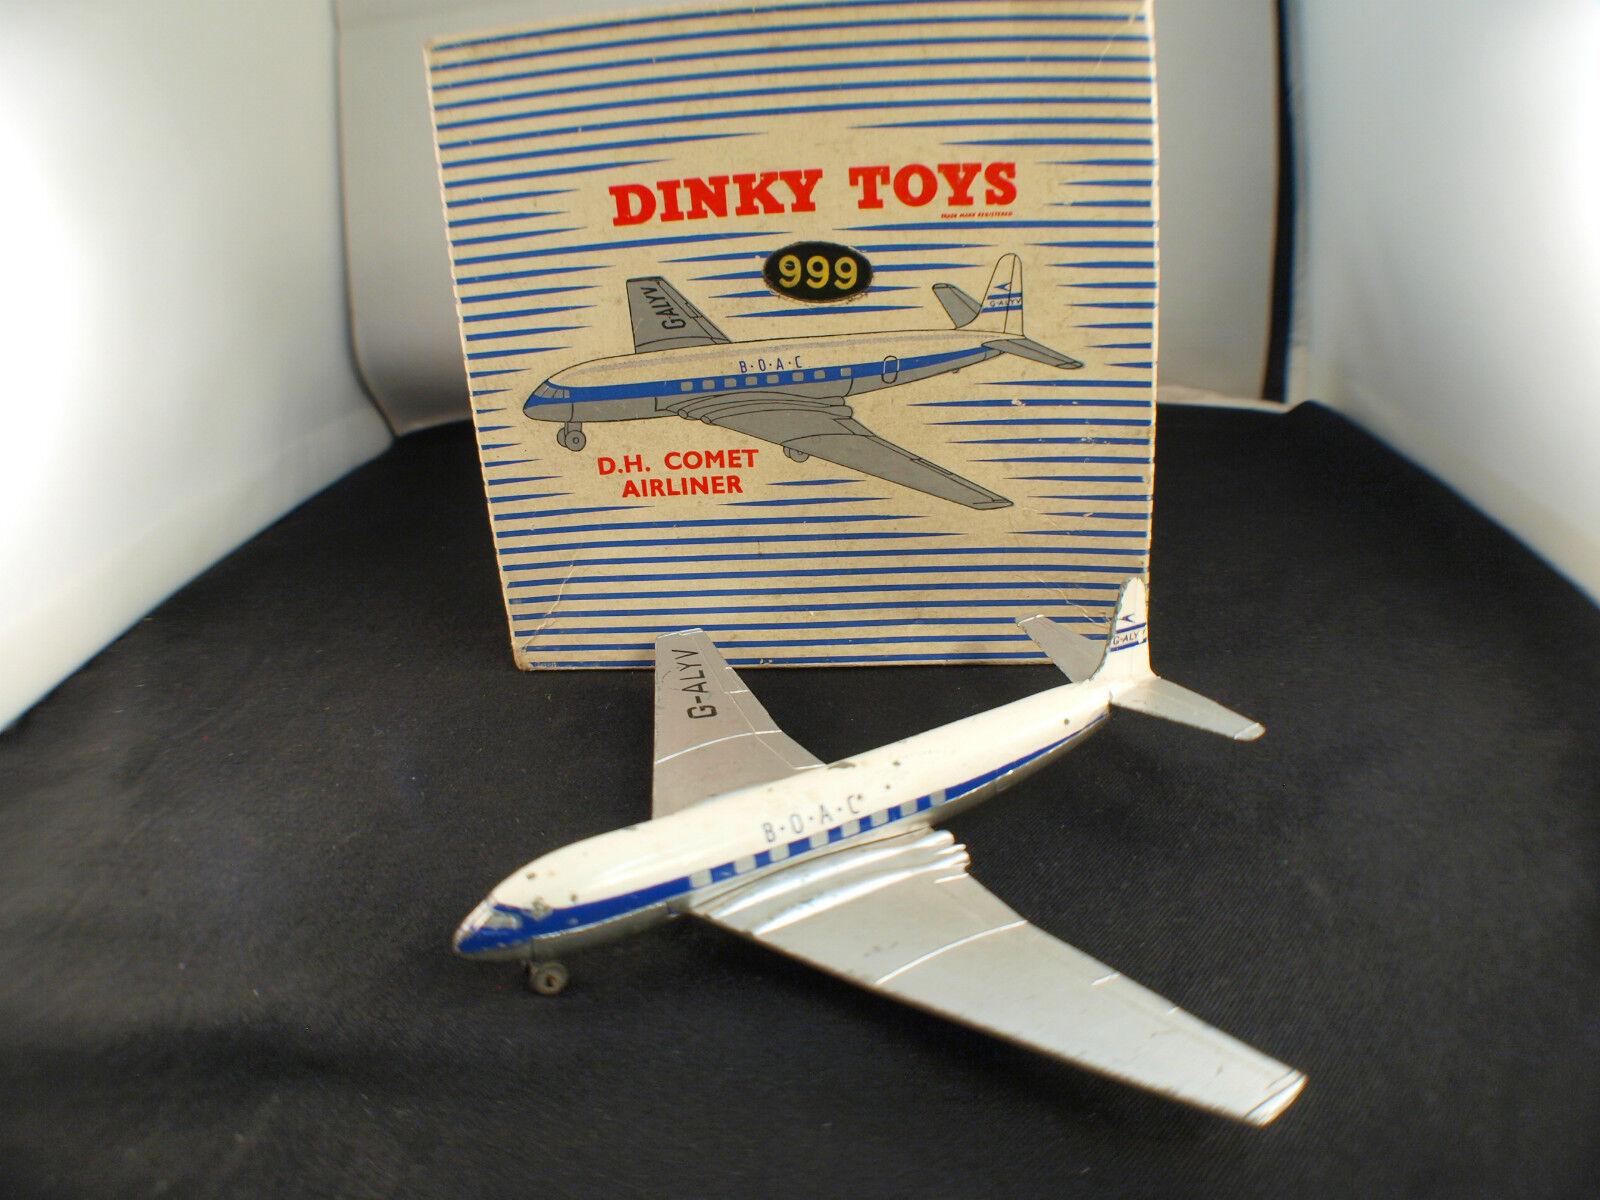 Dinky Toys GB n° 999 avion DH Comet airliner BOAC en boite